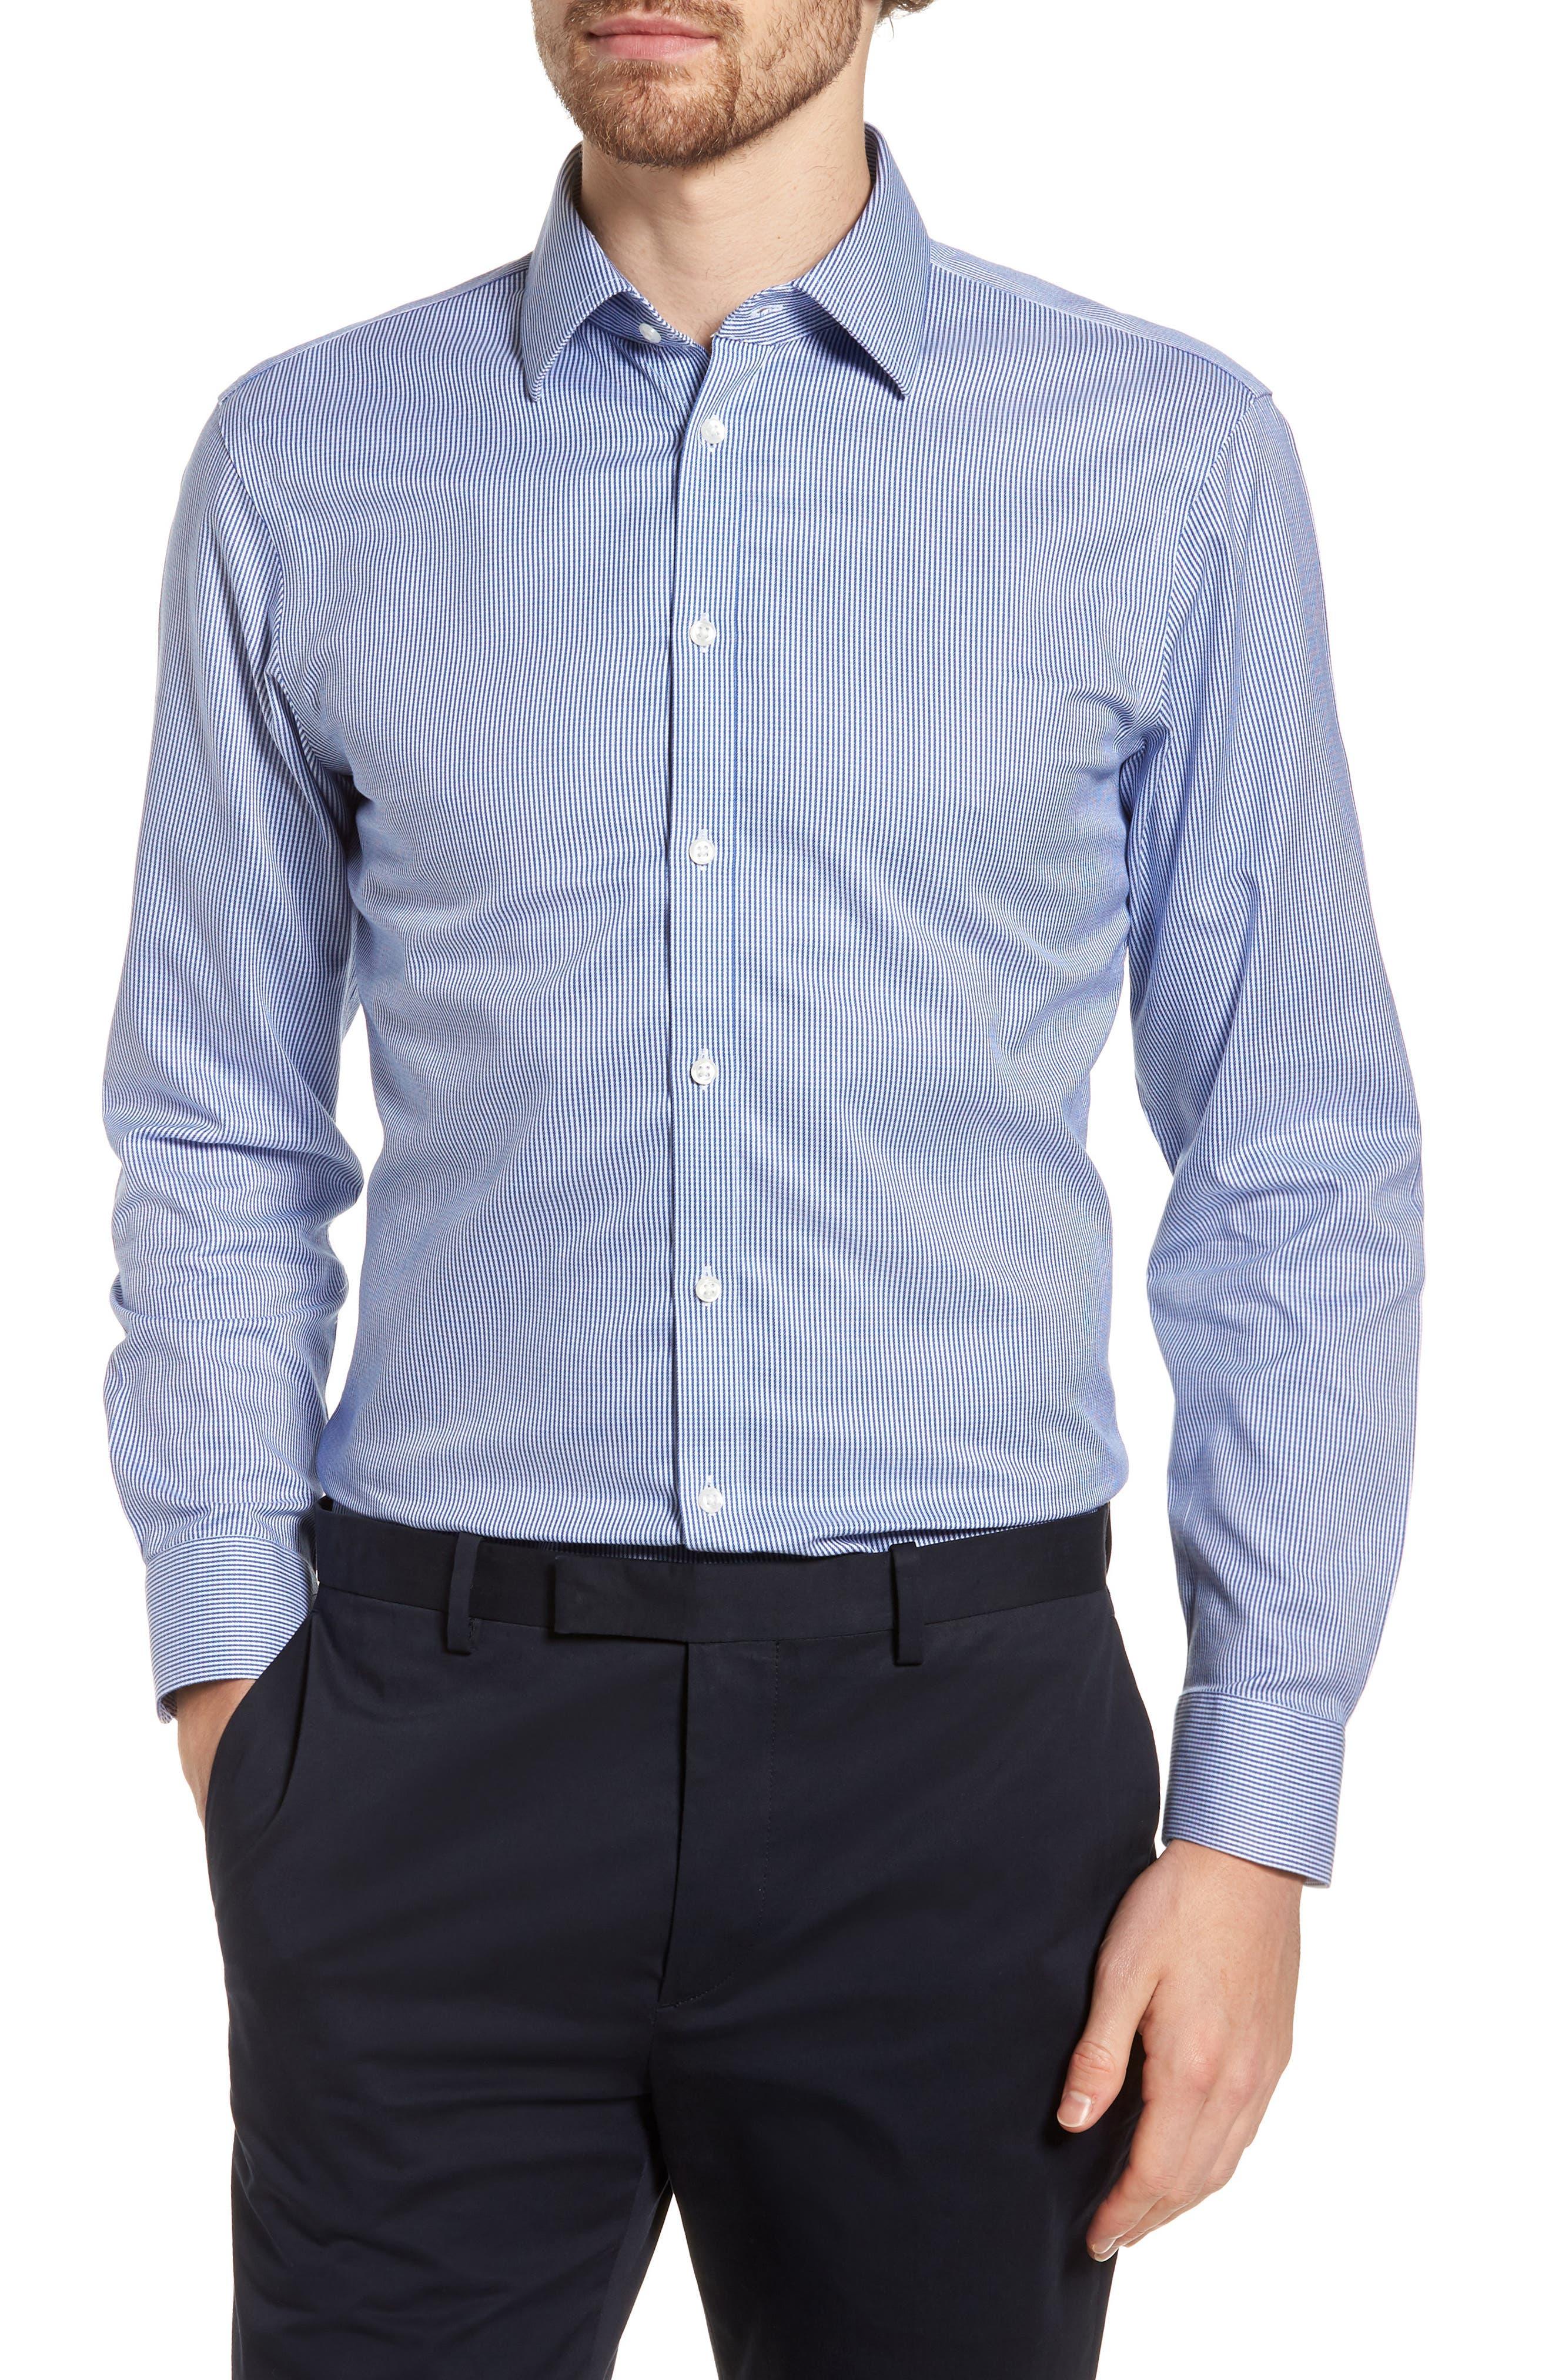 Main Image - Nordstrom Men's Shop Smartcare™ Extra Trim Fit Stripe Dress Shirt